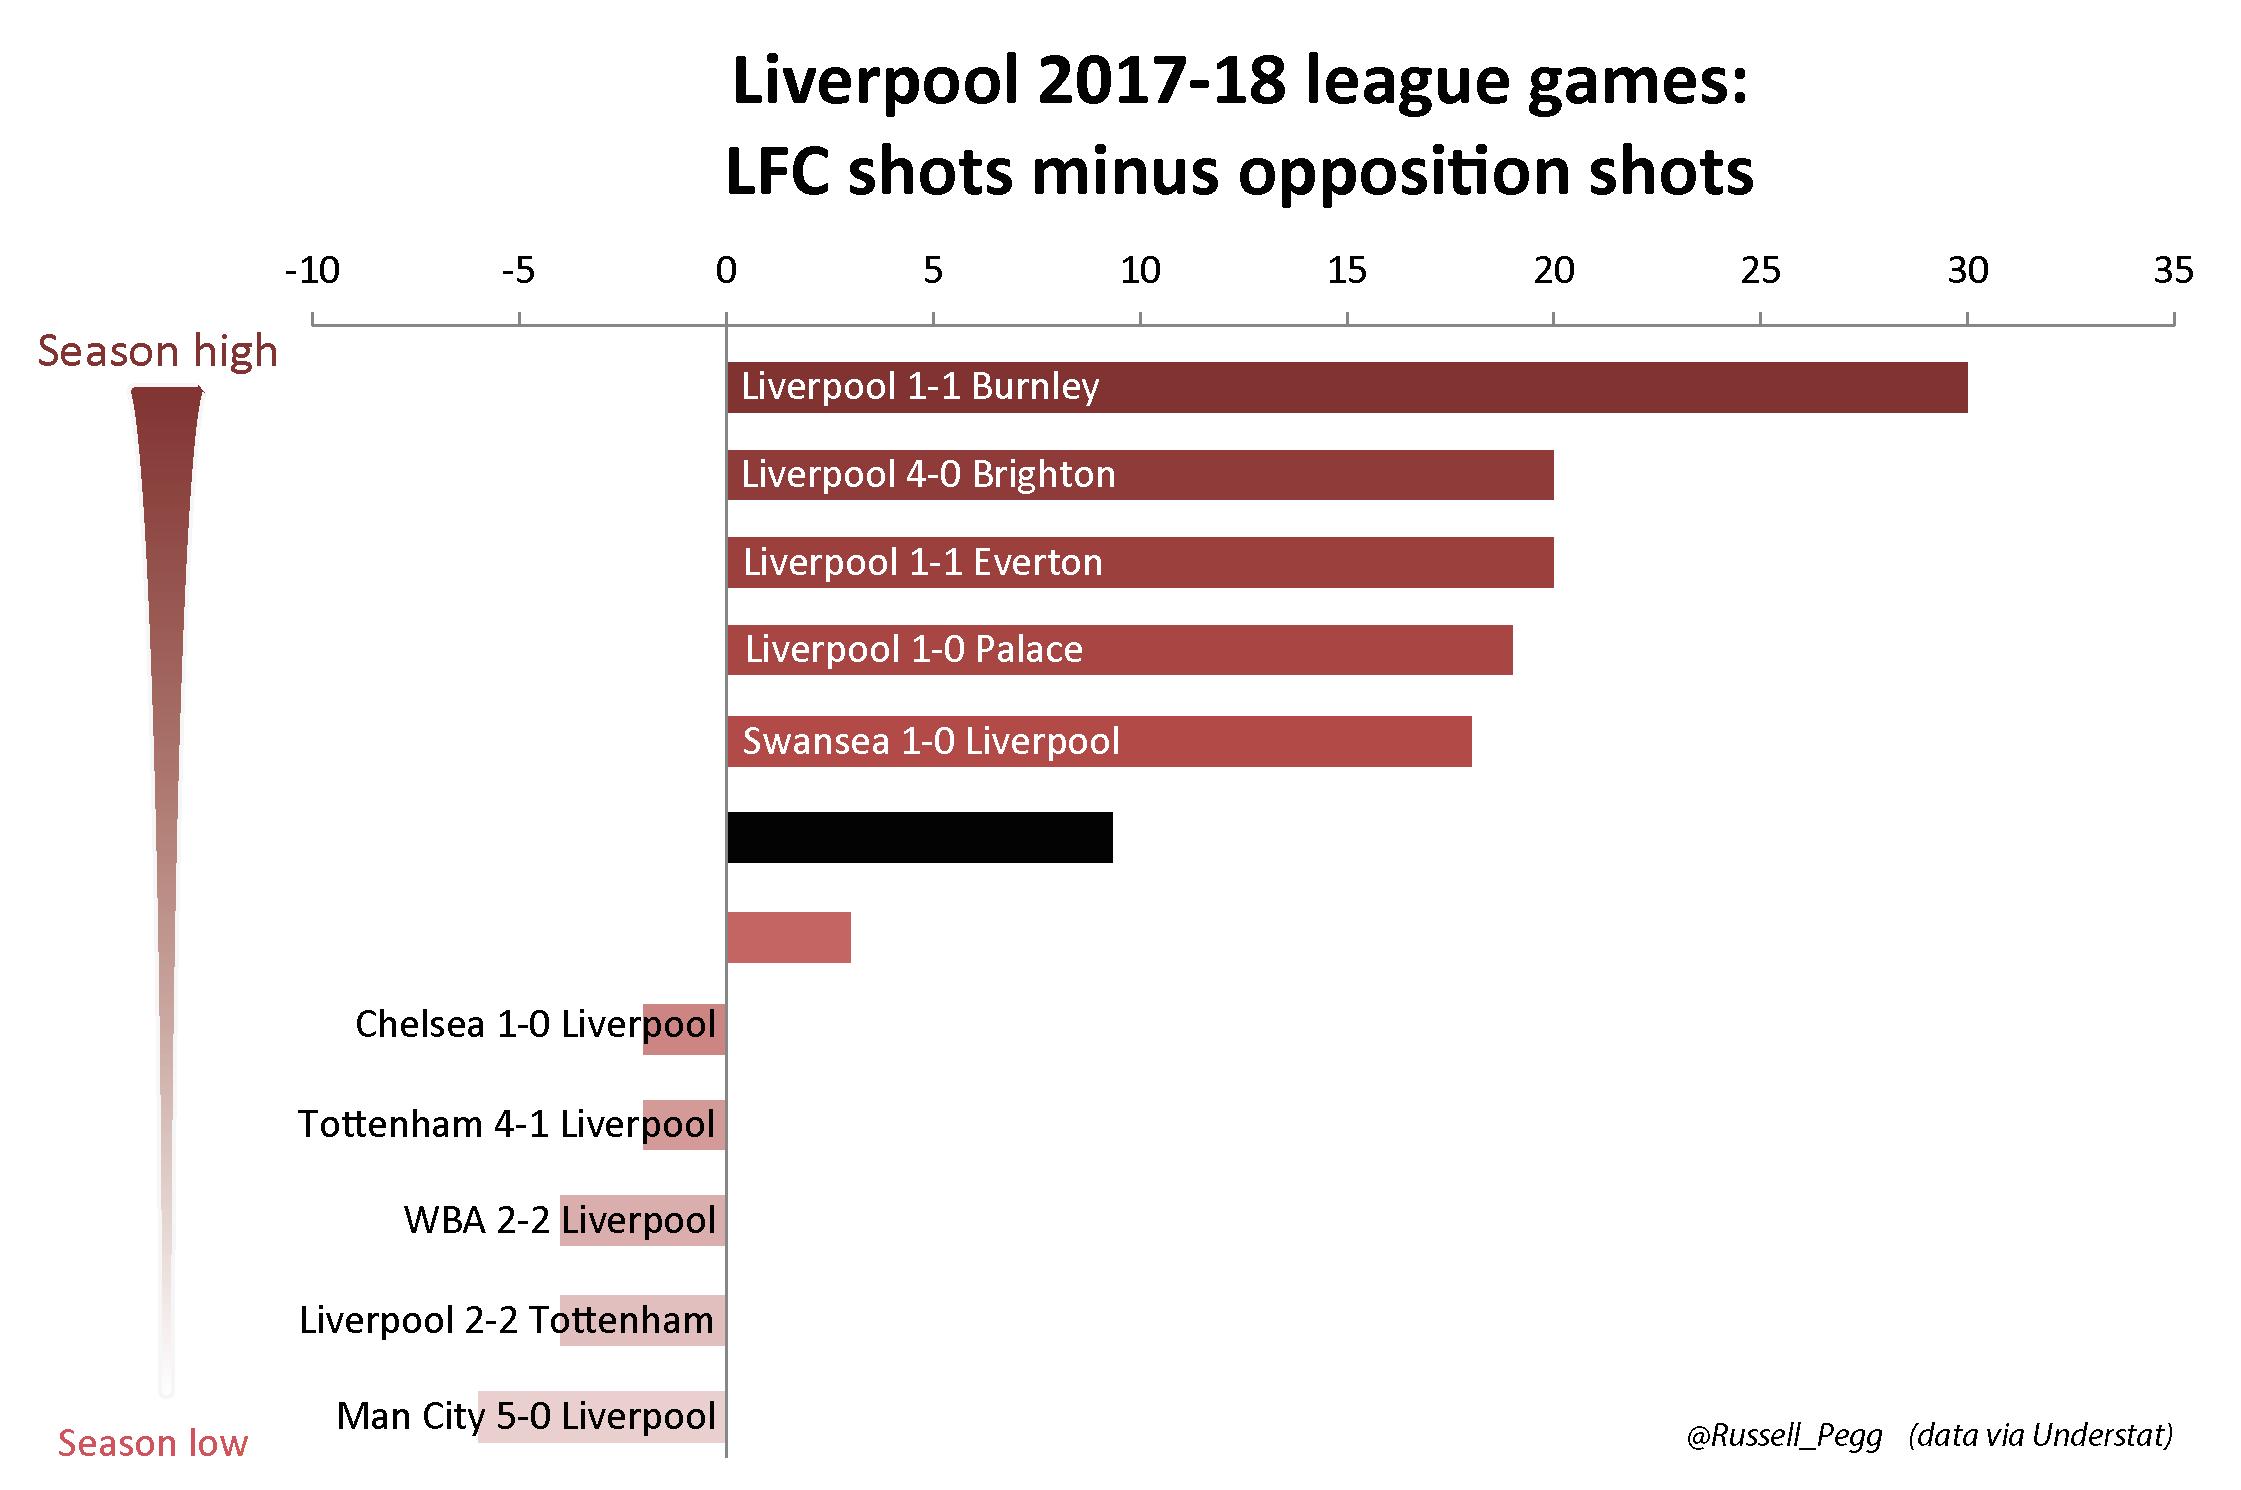 Liverpool 2017-18 league games - LFC shots minus opposition shots v1-01